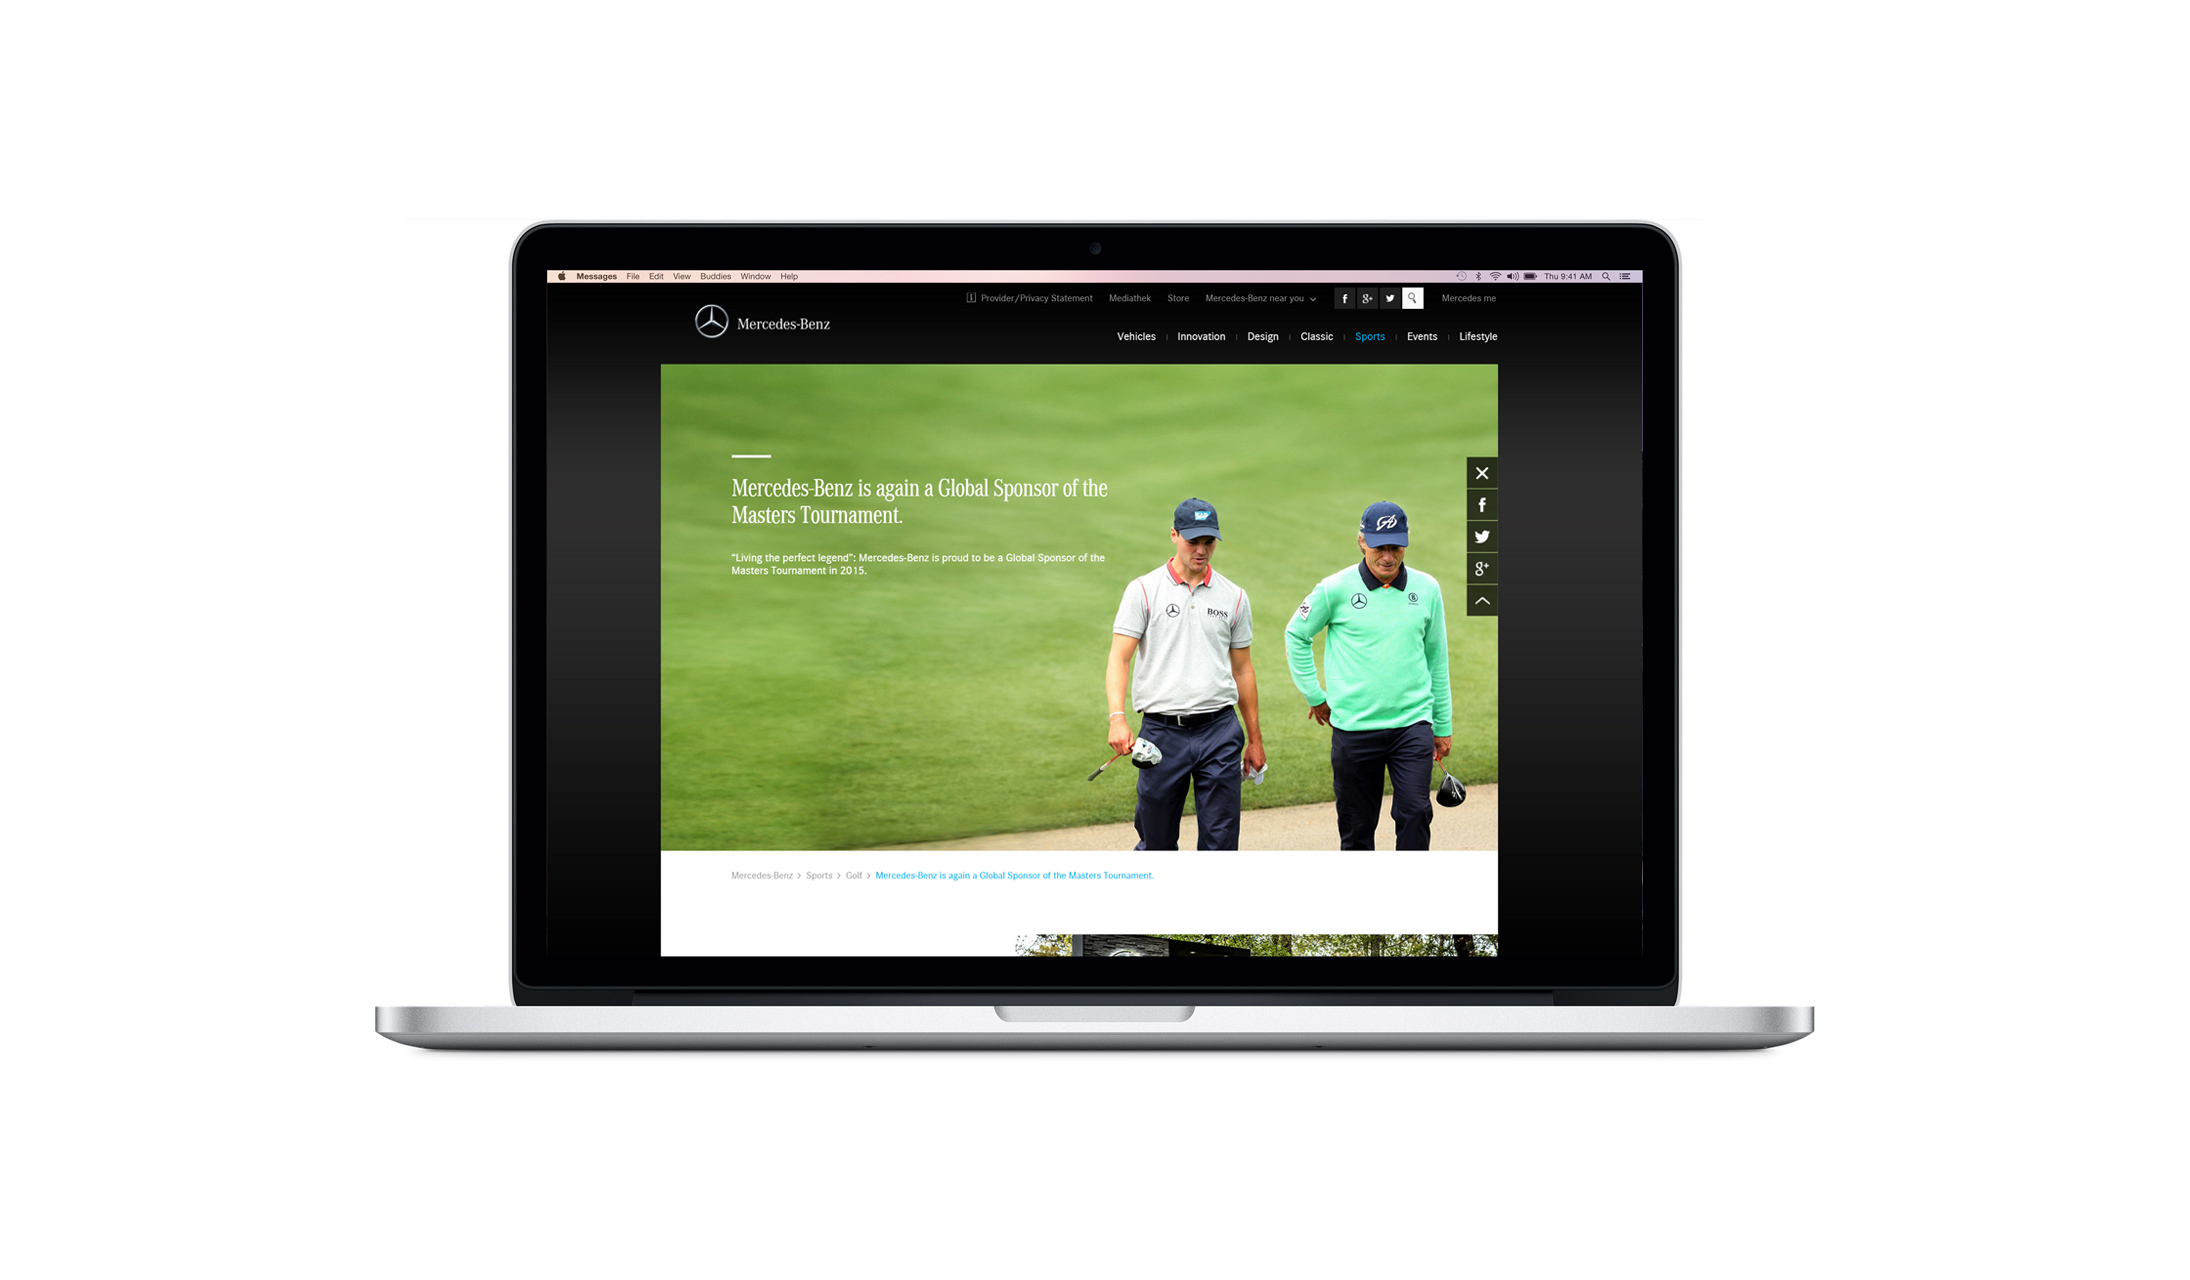 MB_Golf_presence1.jpg